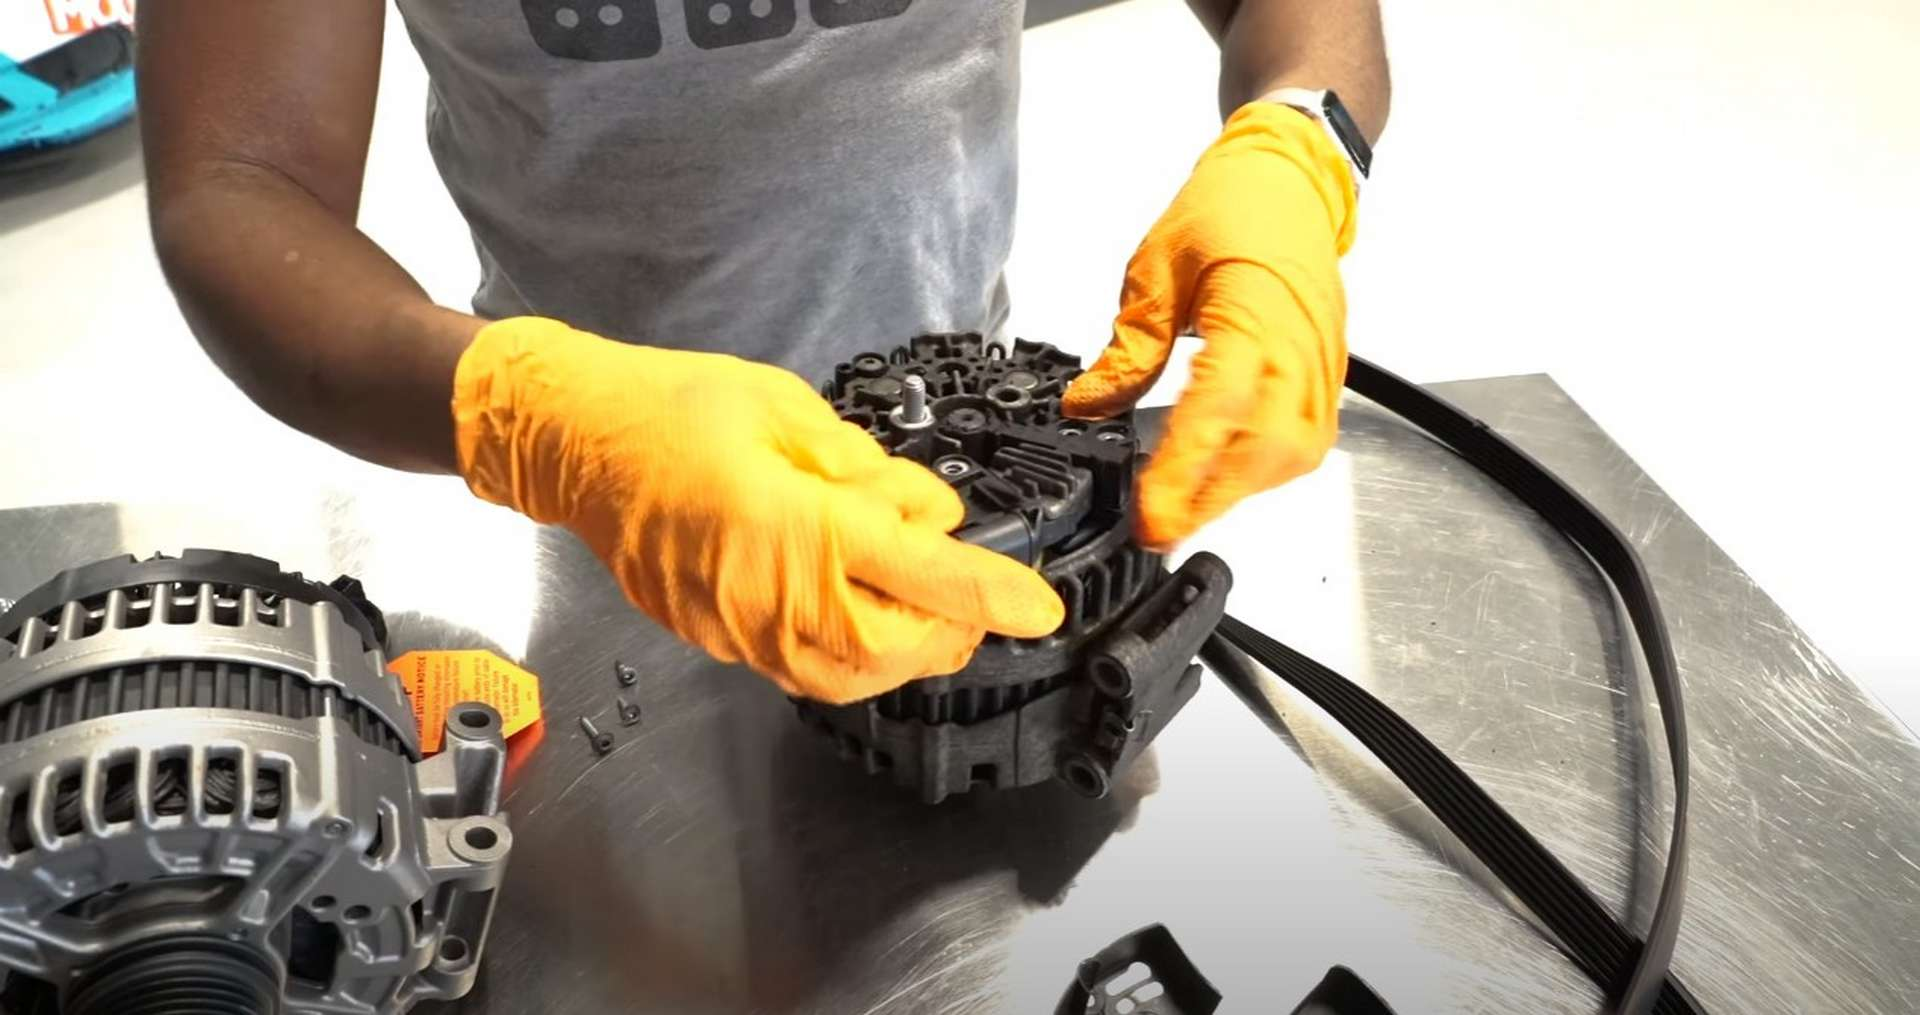 DIY Mercedes W212/204 Alternator and Drive Belt Replacement removing the voltage regulator